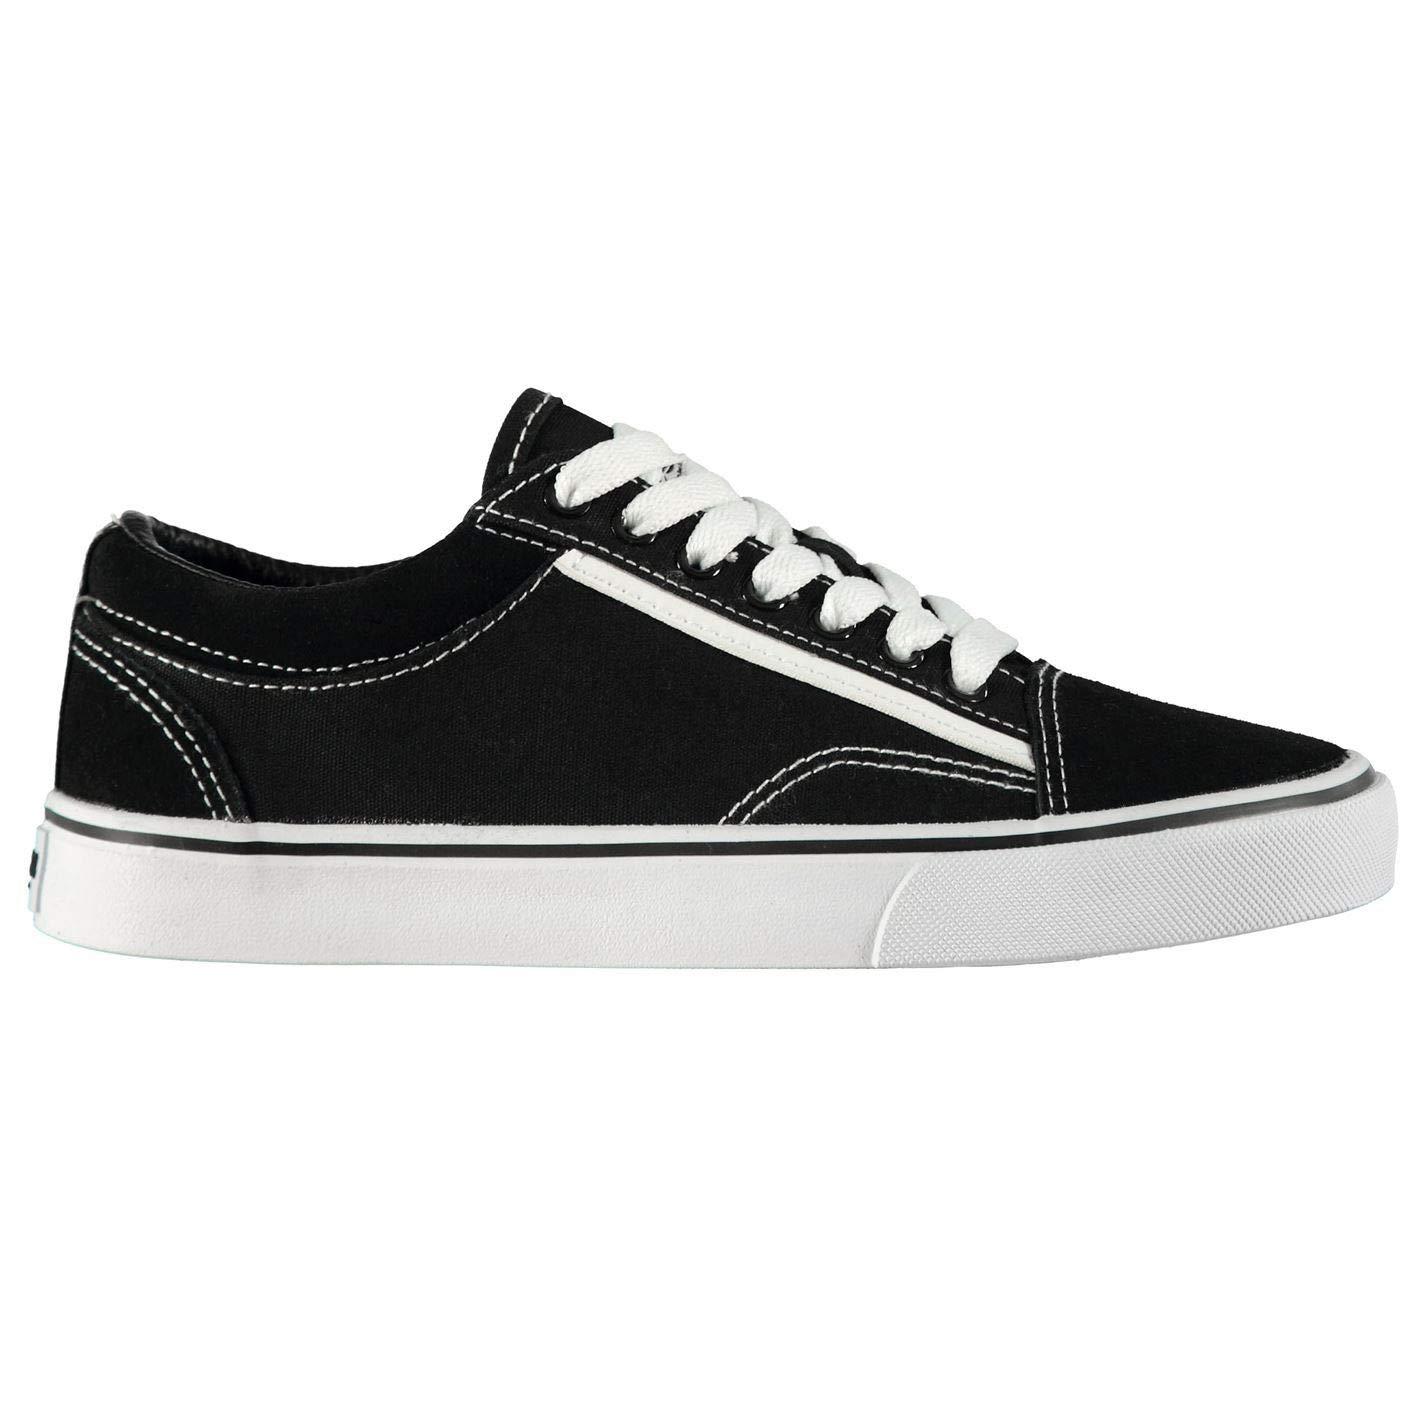 2fdb0a8e1 Amazon.com: SoulCal Cali Girls Canvas Shoes Black/White Trainers Footwear:  Shoes